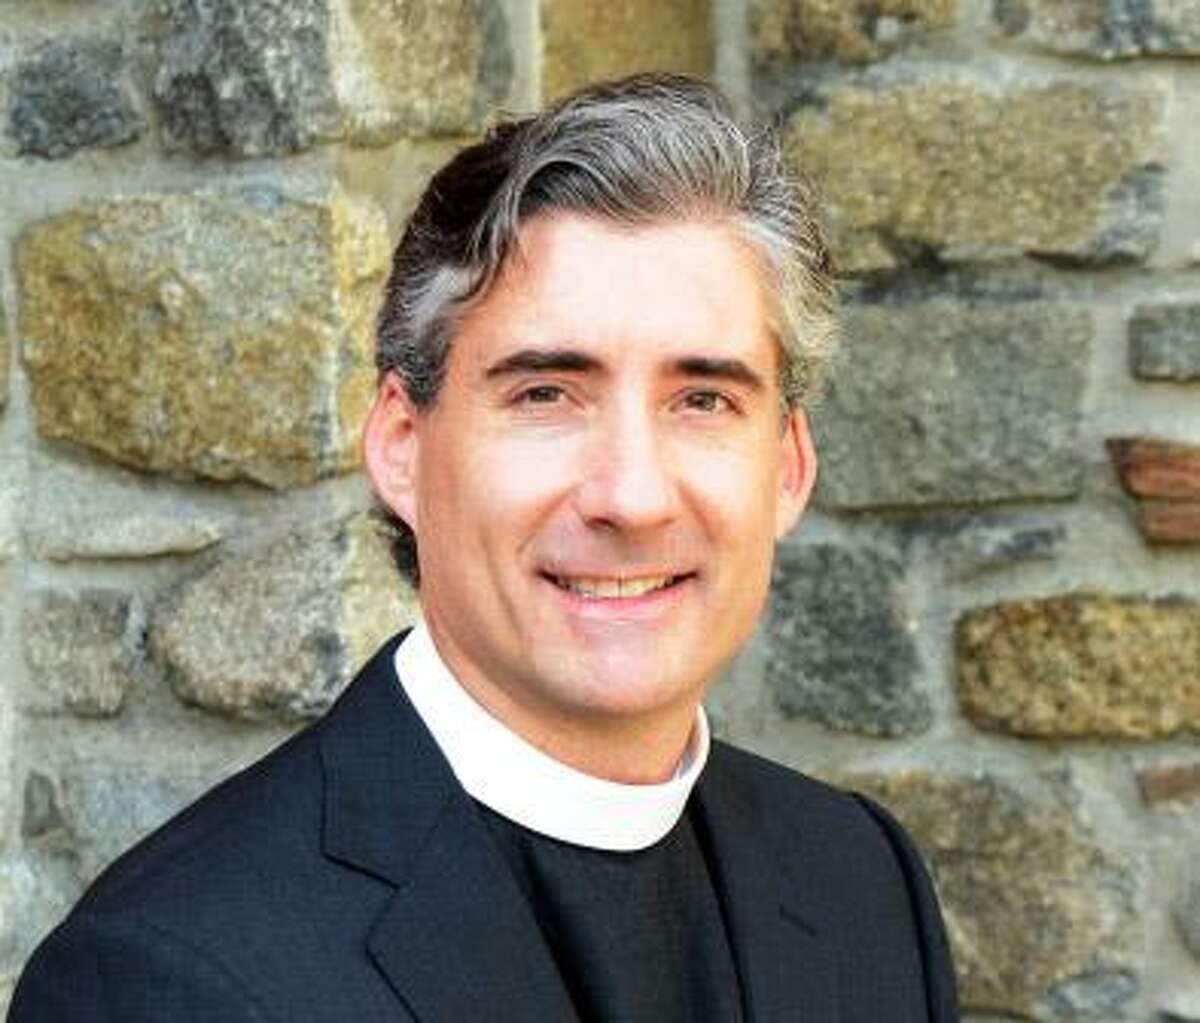 Rev. Joseph Shepley is the rector of St. Paul's Episcopal Church in Brookfield, Conn.